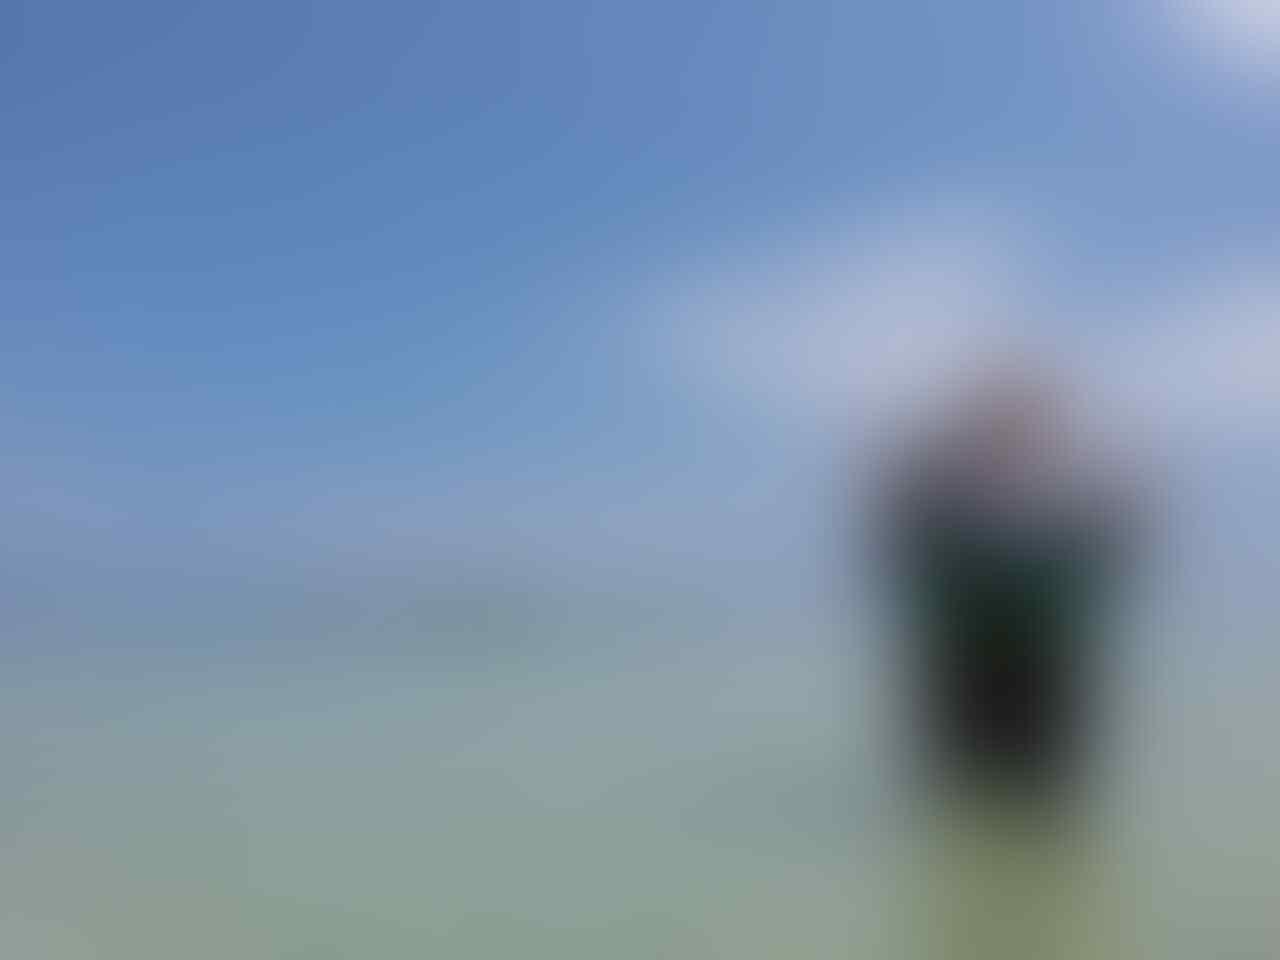 [eRYe-OFFICIAL]۞-Biodata Kaskuser Regional Yogyakarta-۞